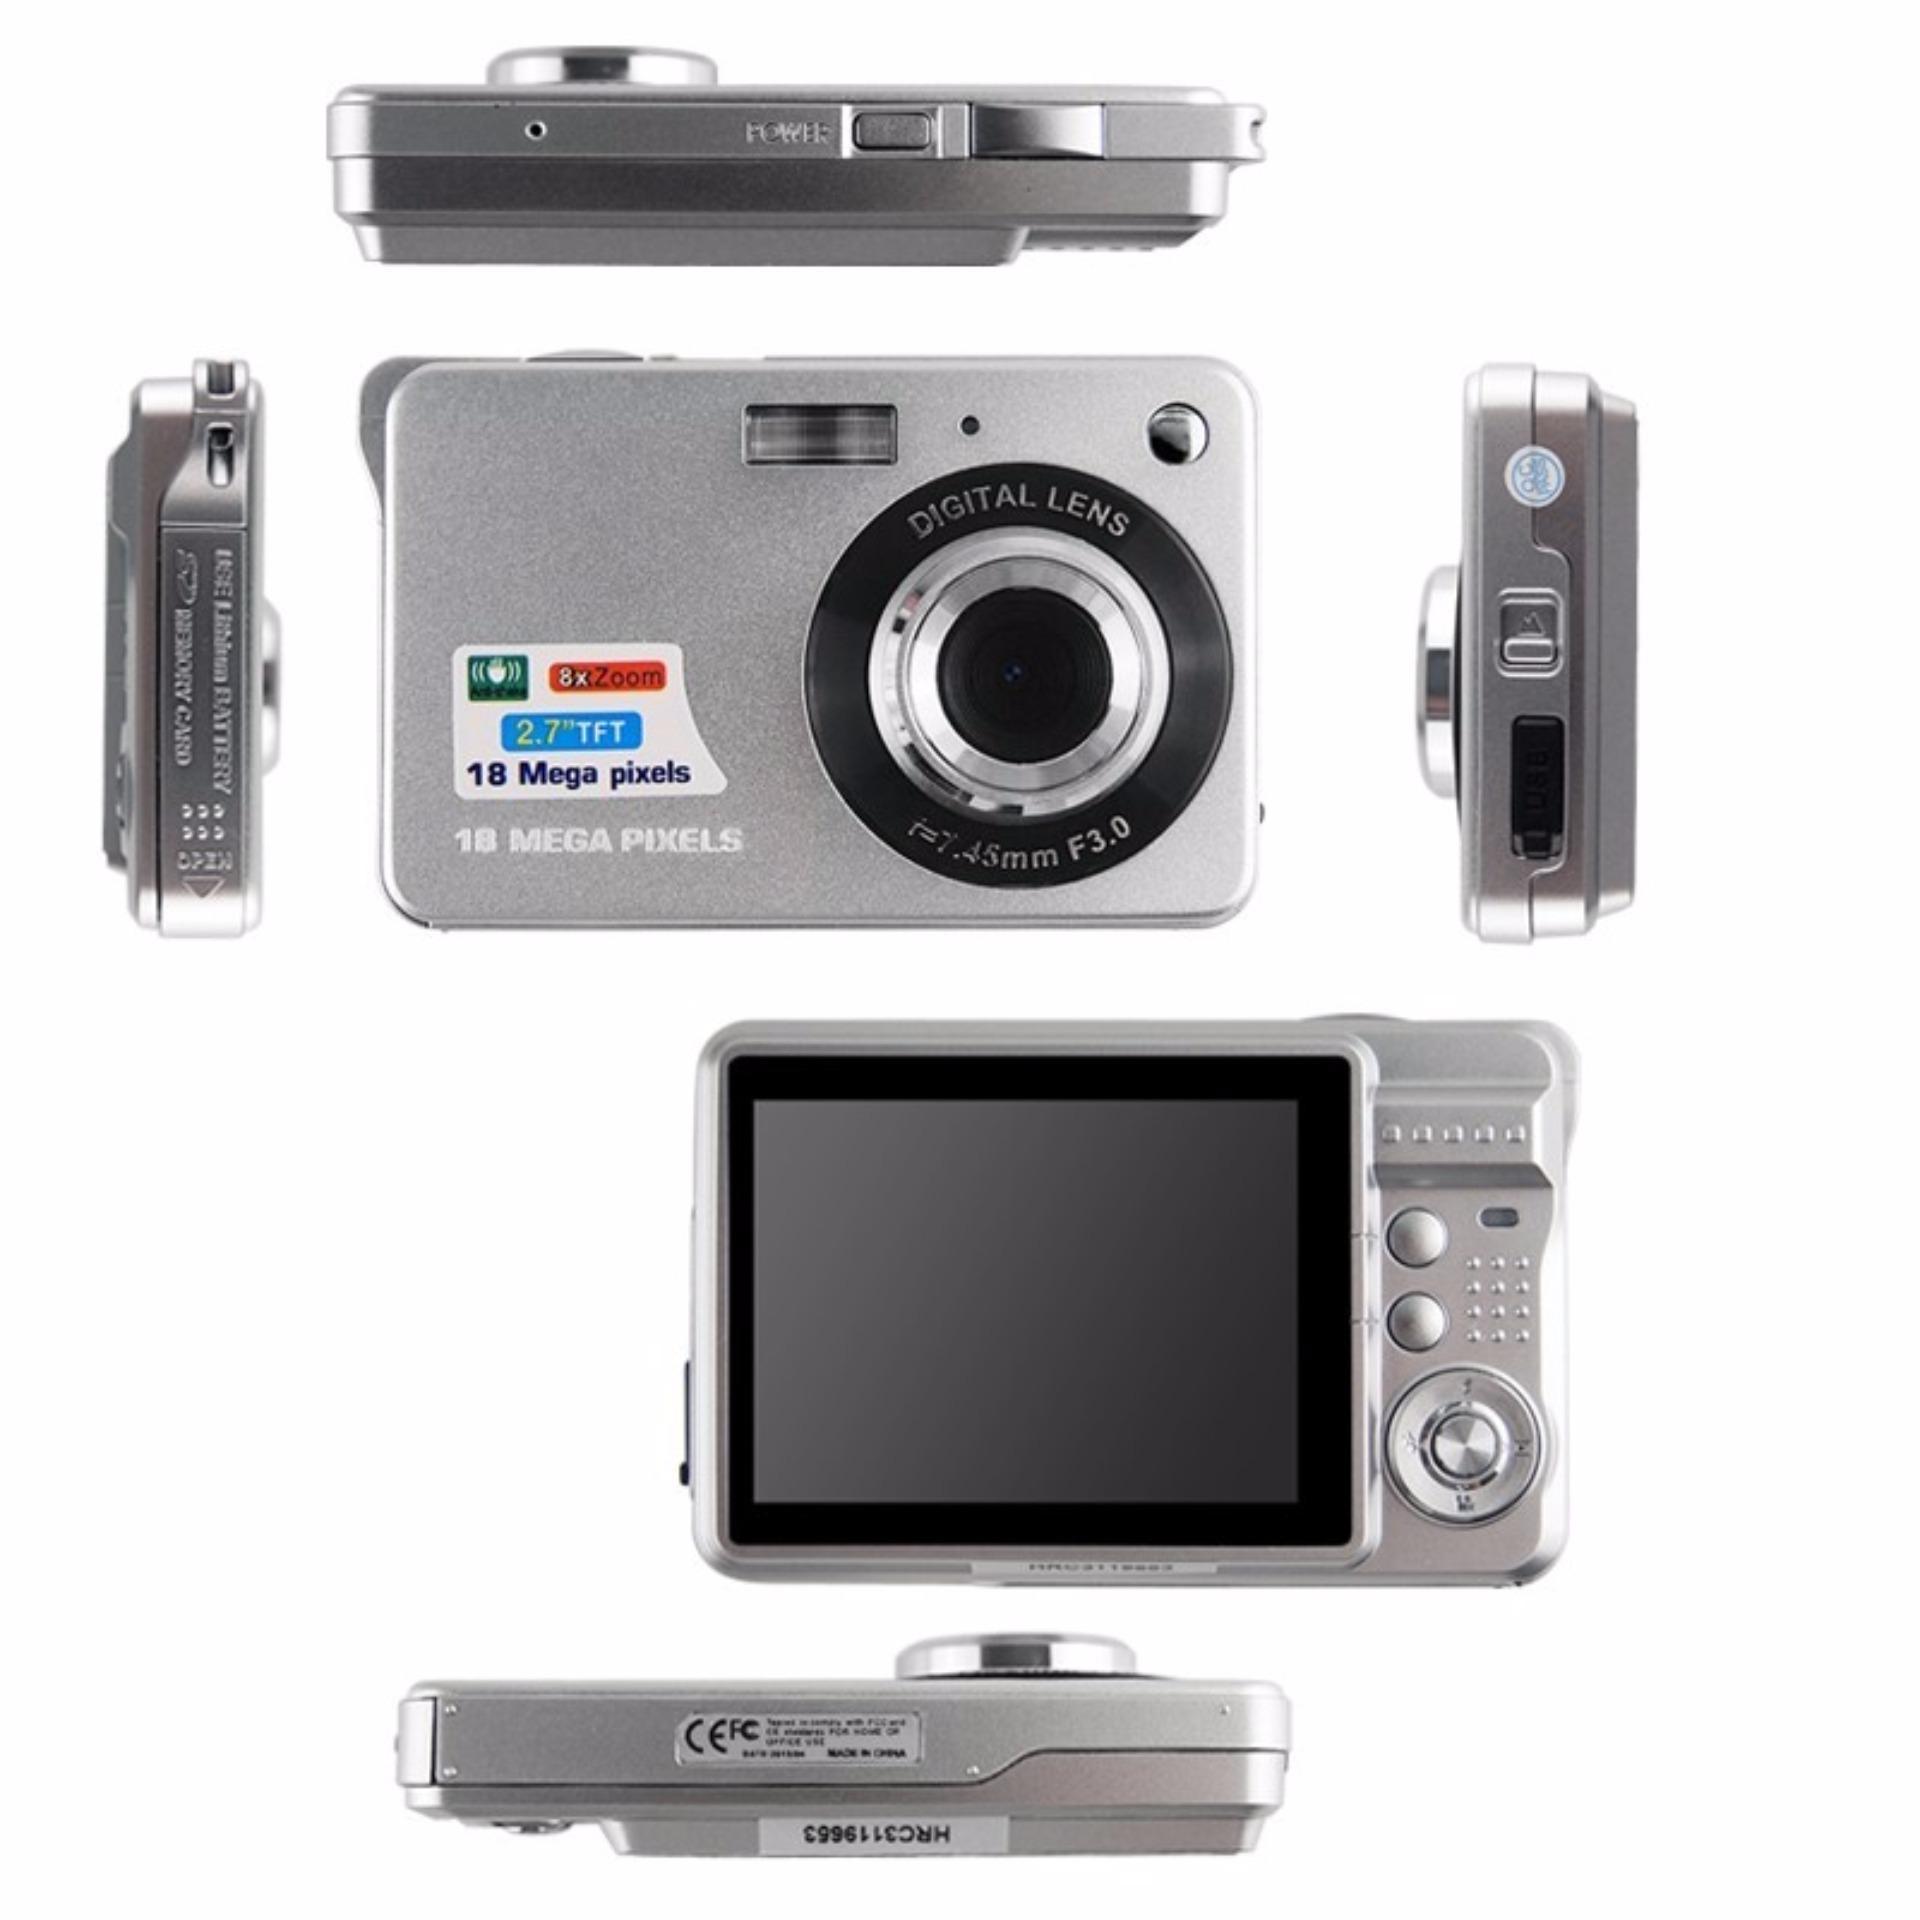 Mini Digital Camera 8x Digital Zoom Digital Photo Frame 2.75MP COMS ...